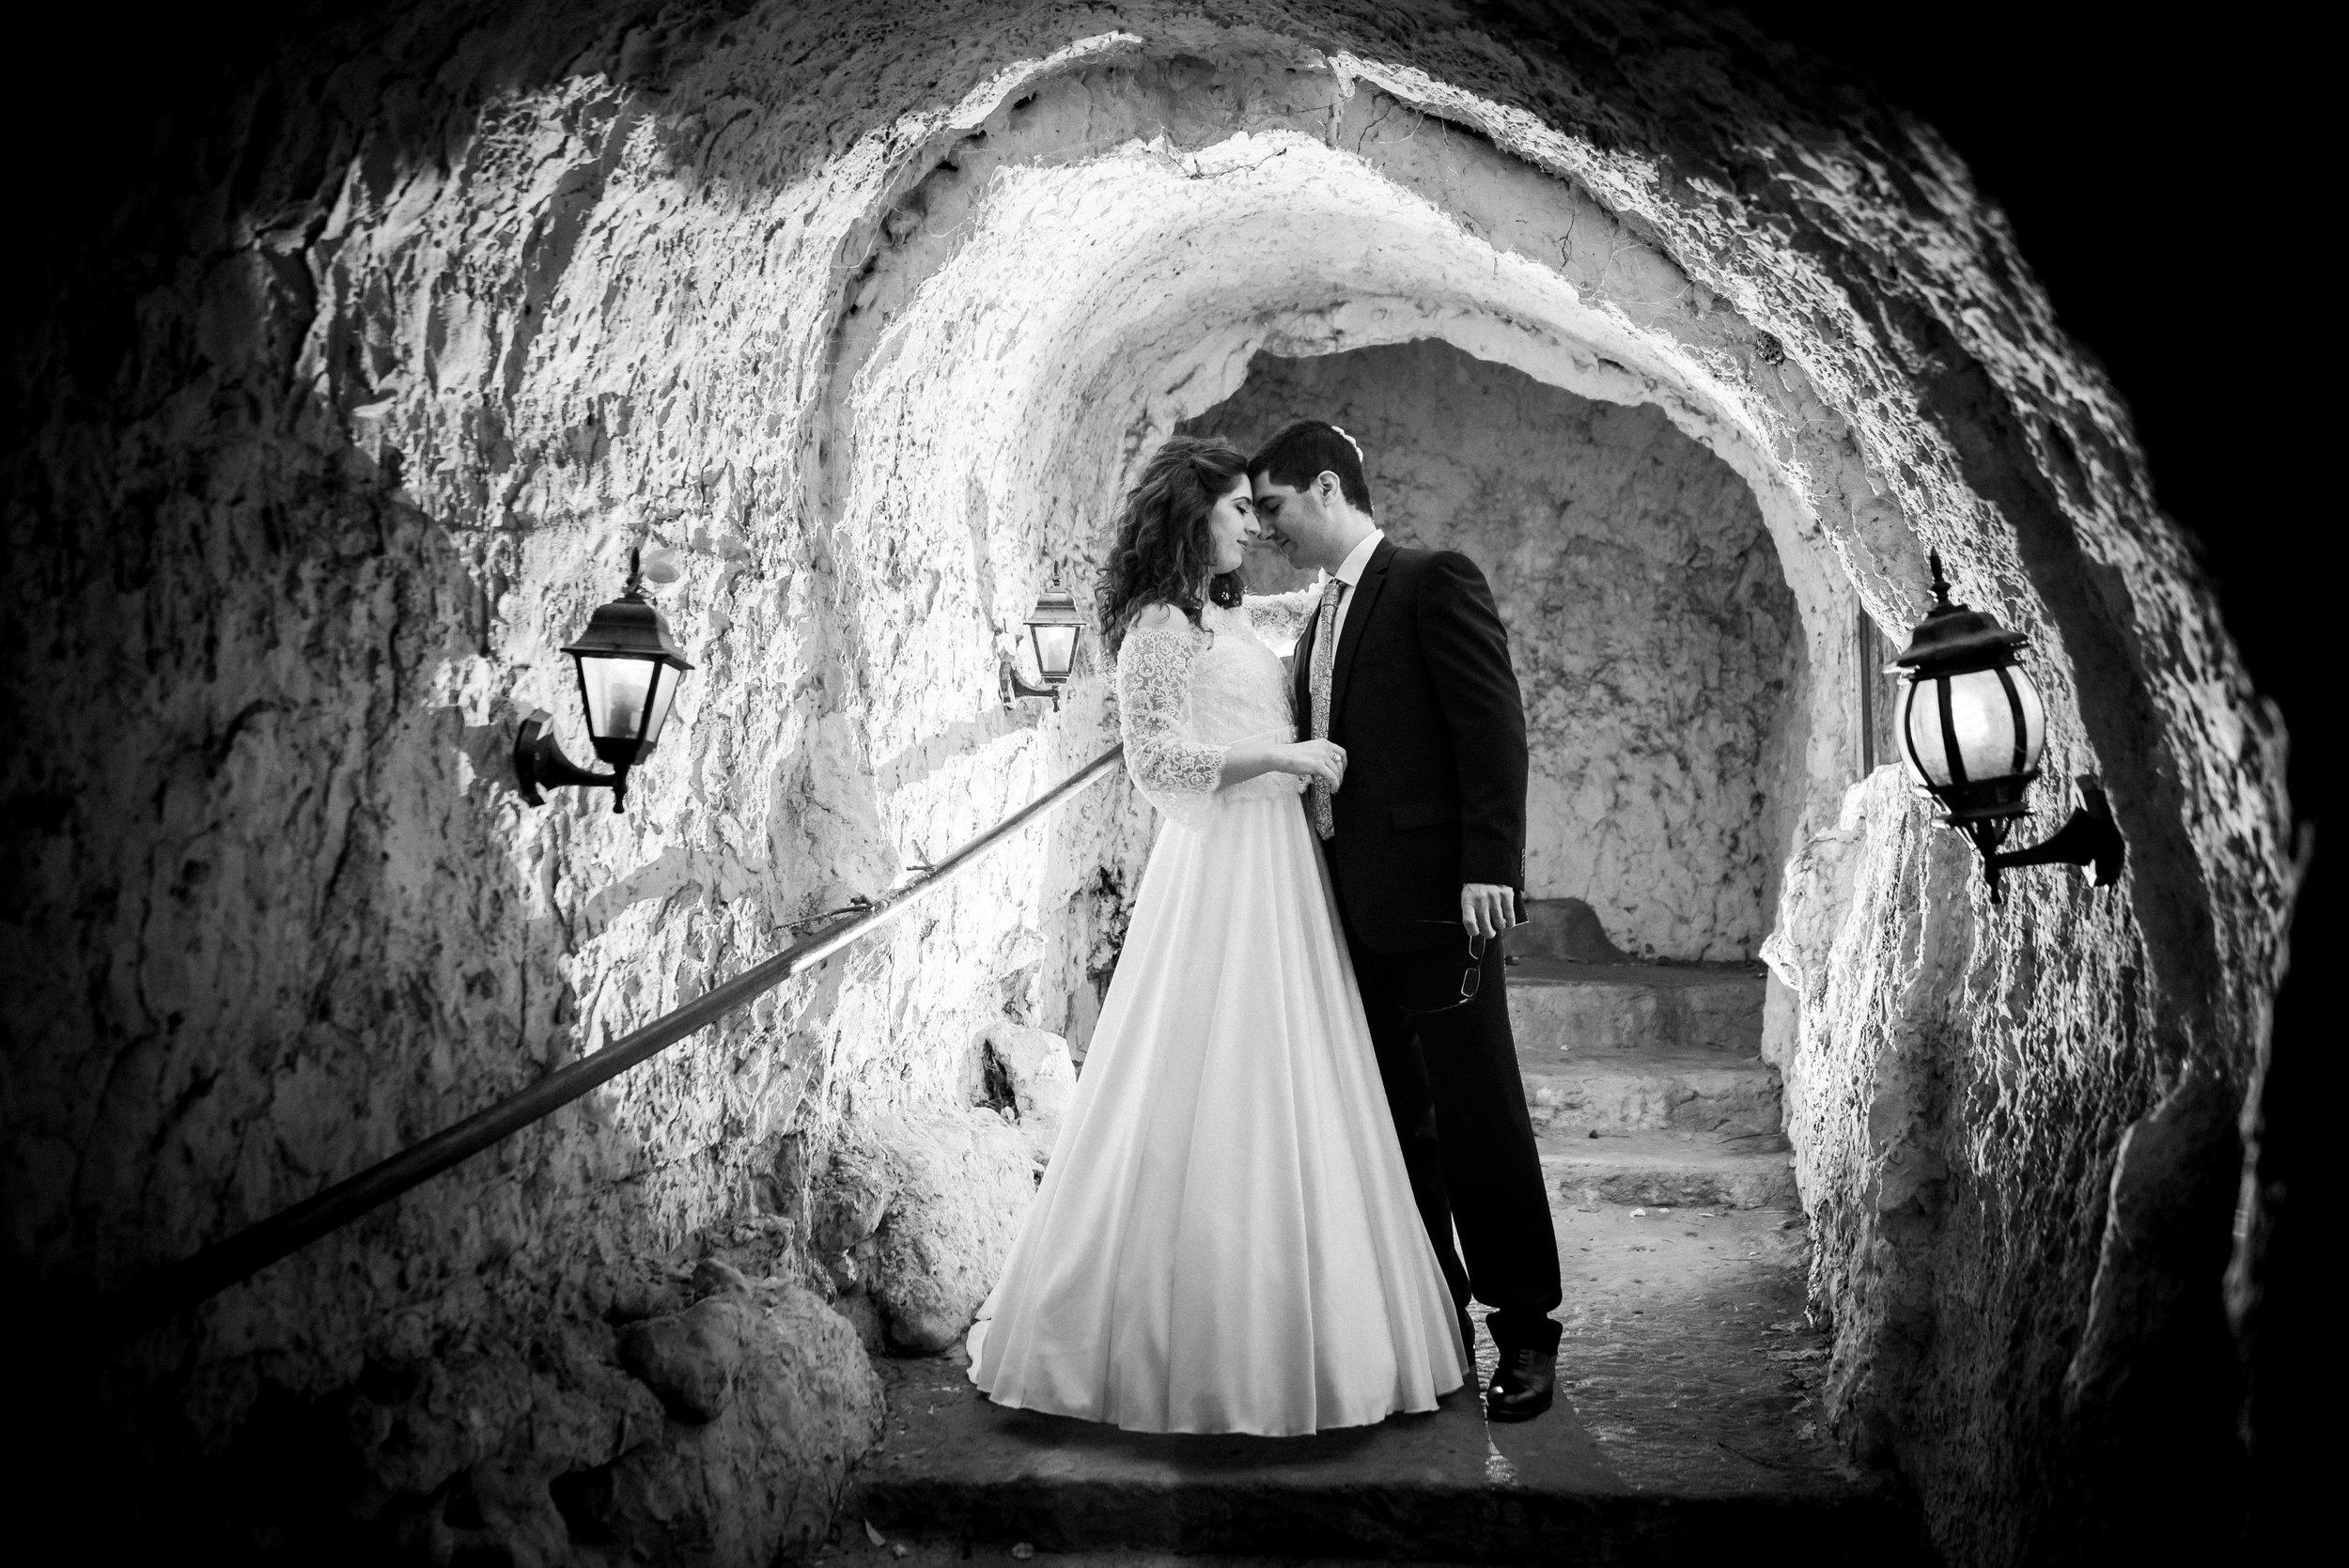 israel-garden-wedding-portraits-session-kate-giryes-photography--29_WEB.jpg